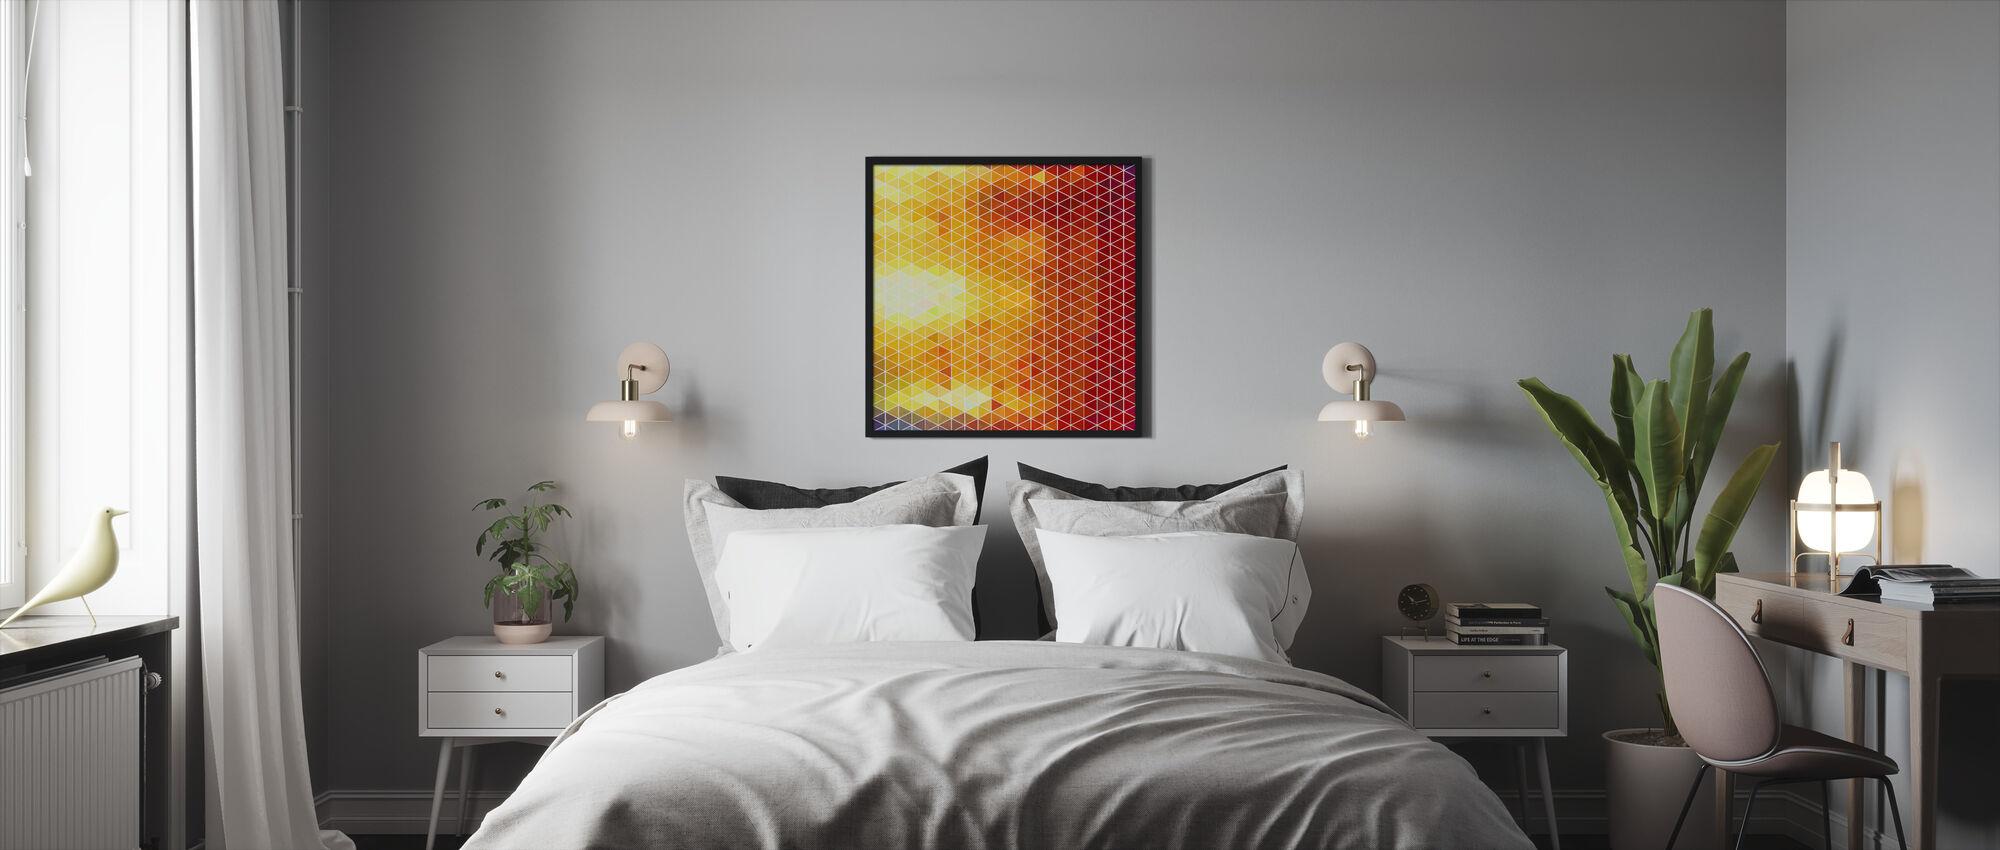 No Gradients - Framed print - Bedroom